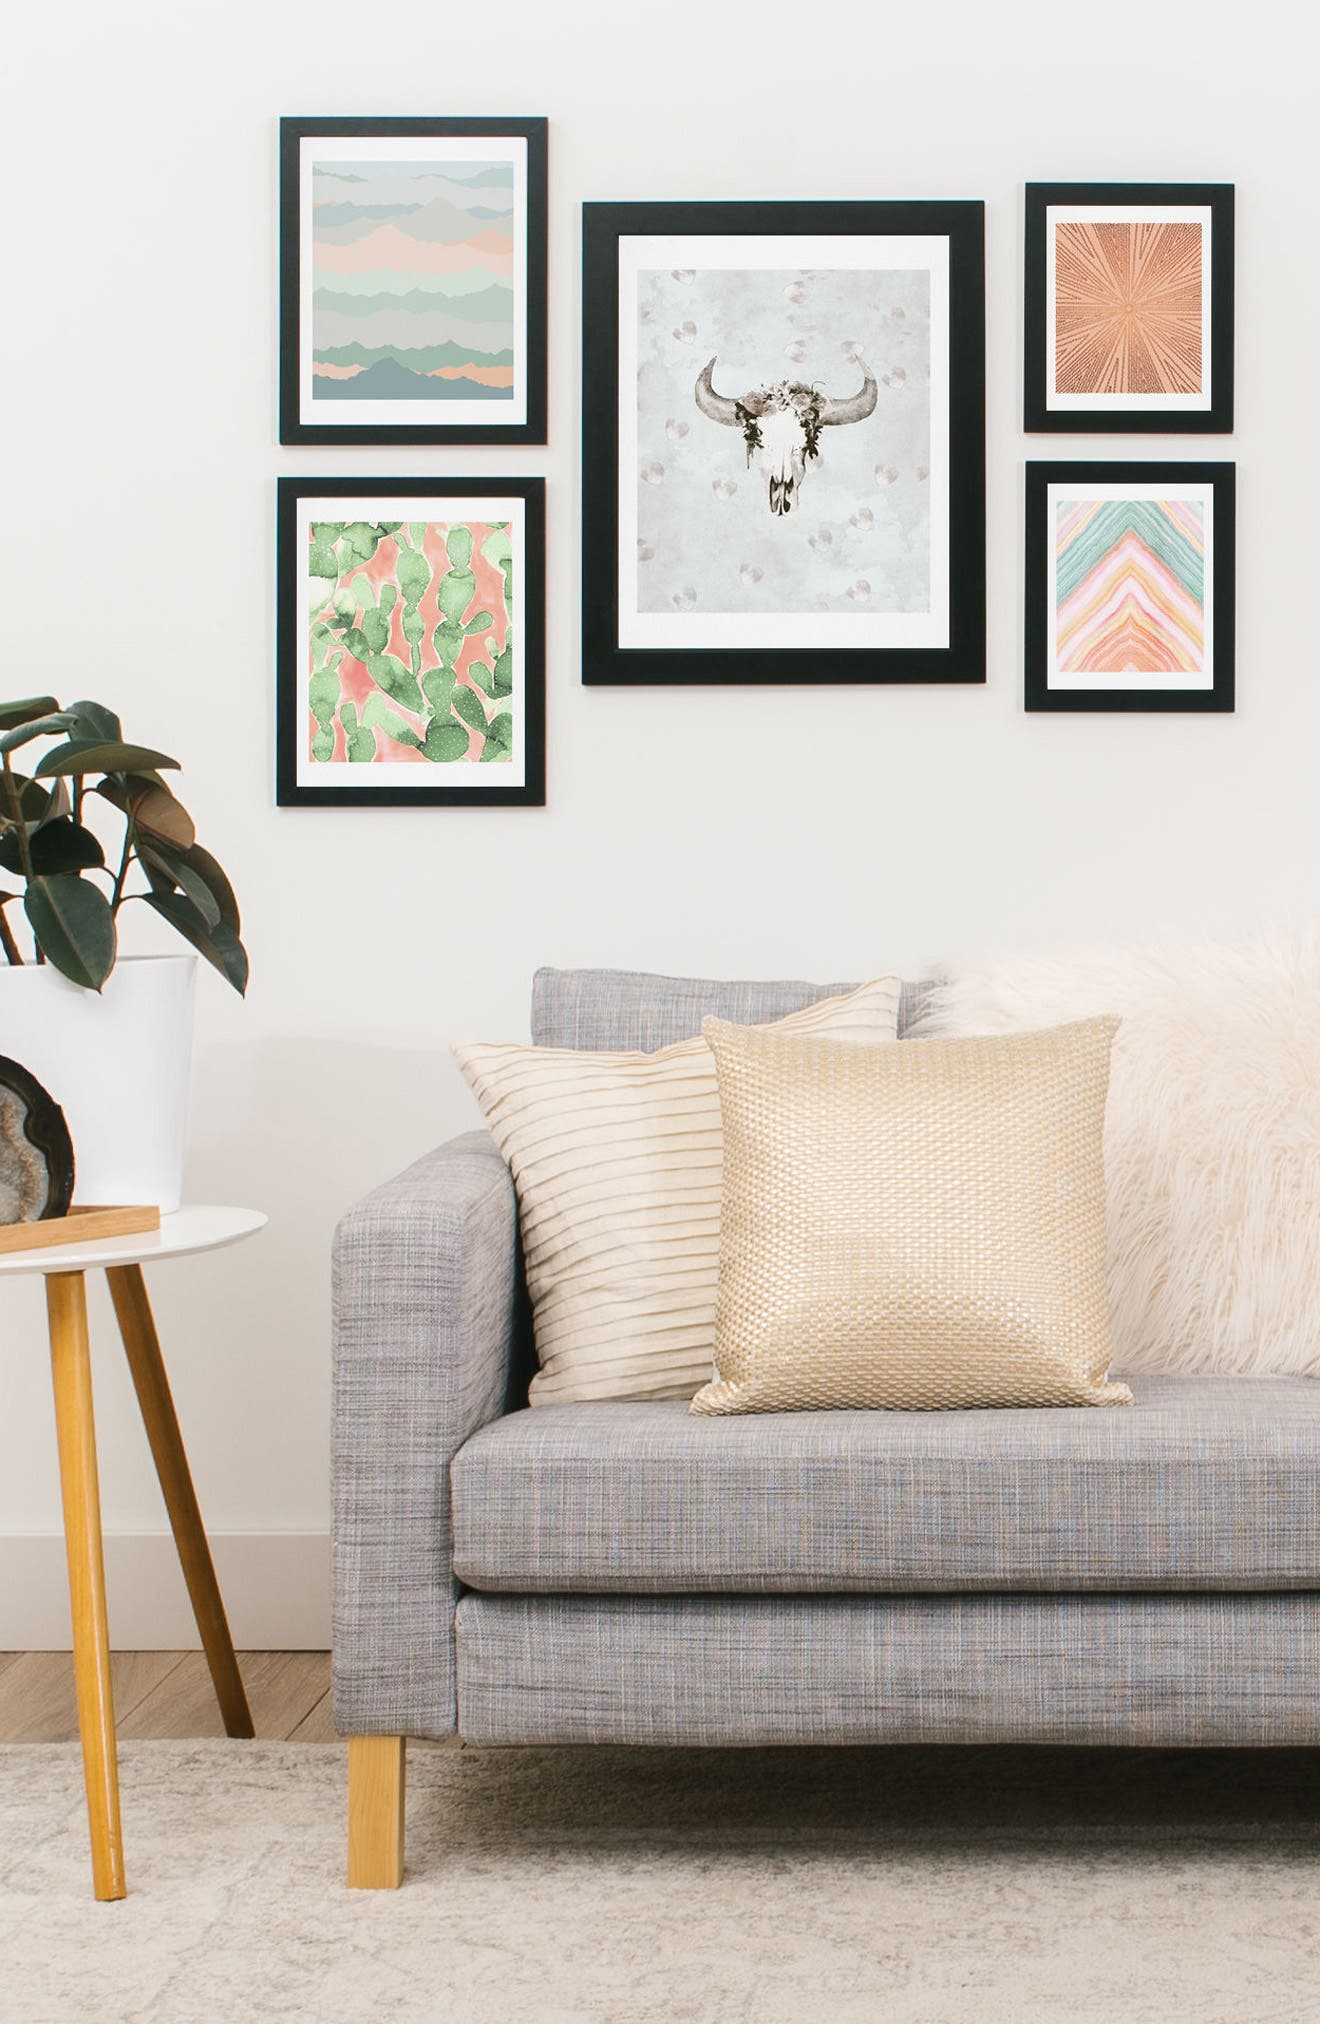 Desert Matcha Five-Piece Gallery Wall Art Print Set,                             Alternate thumbnail 2, color,                             BLUSH AND GREEN